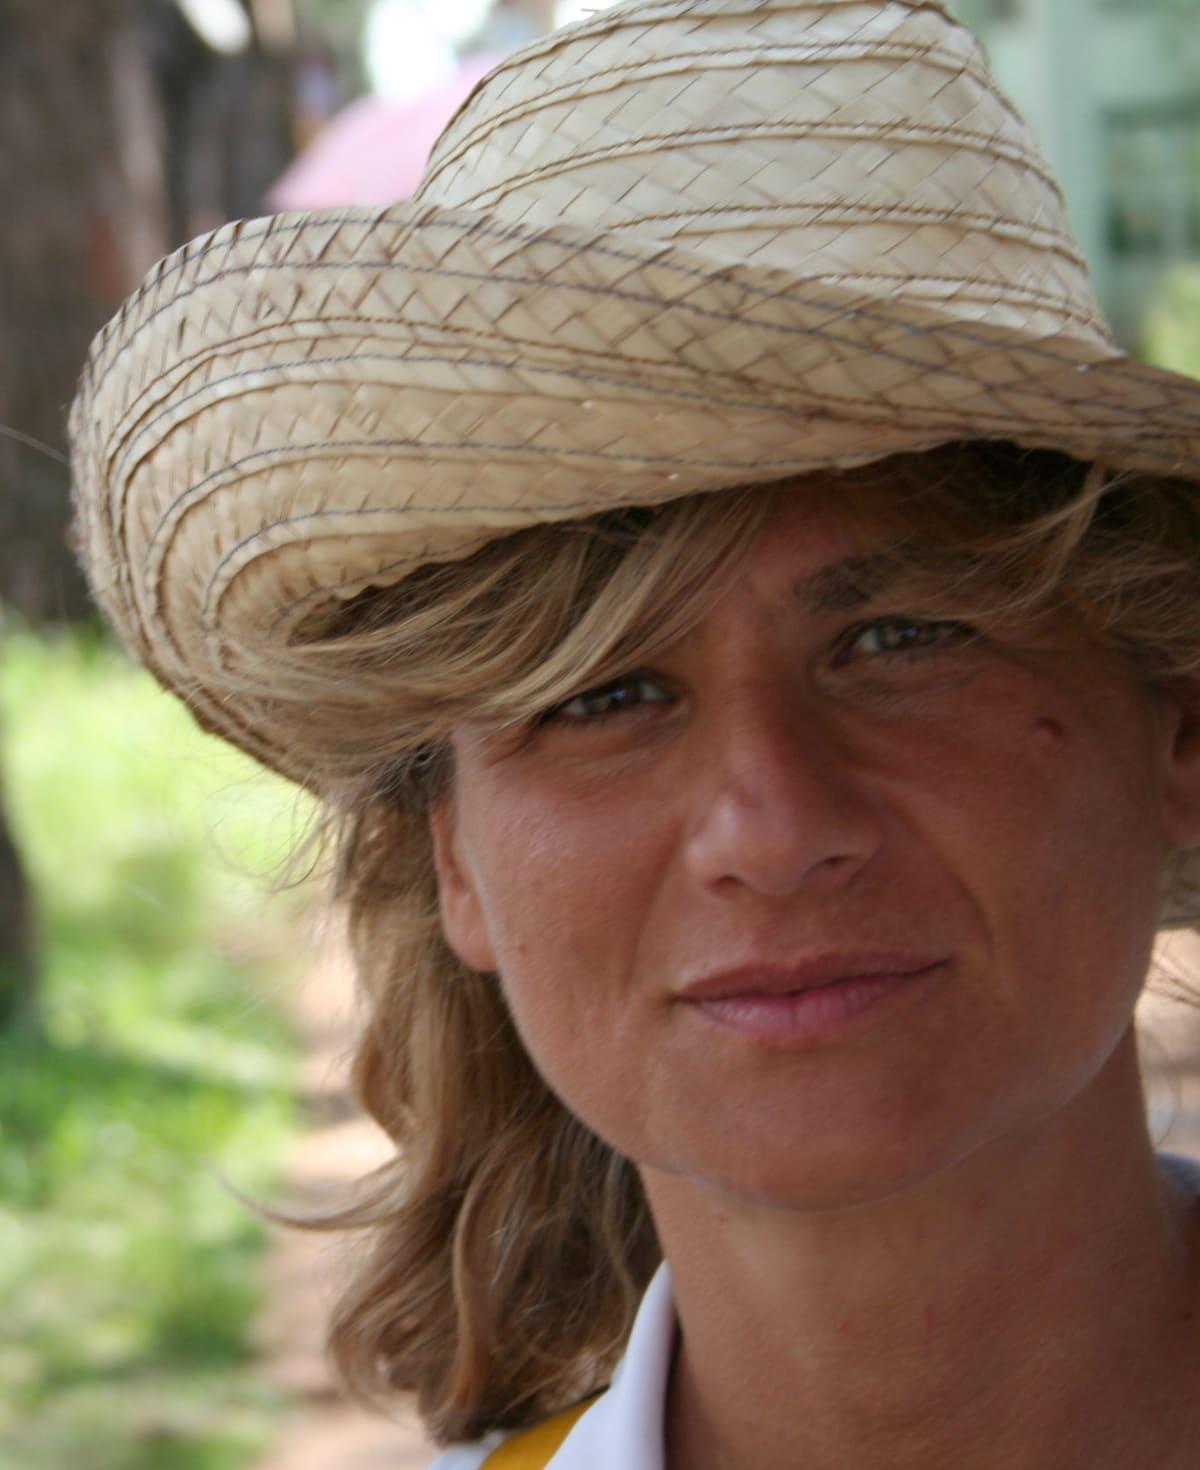 Enrica From Bergamo, Italy